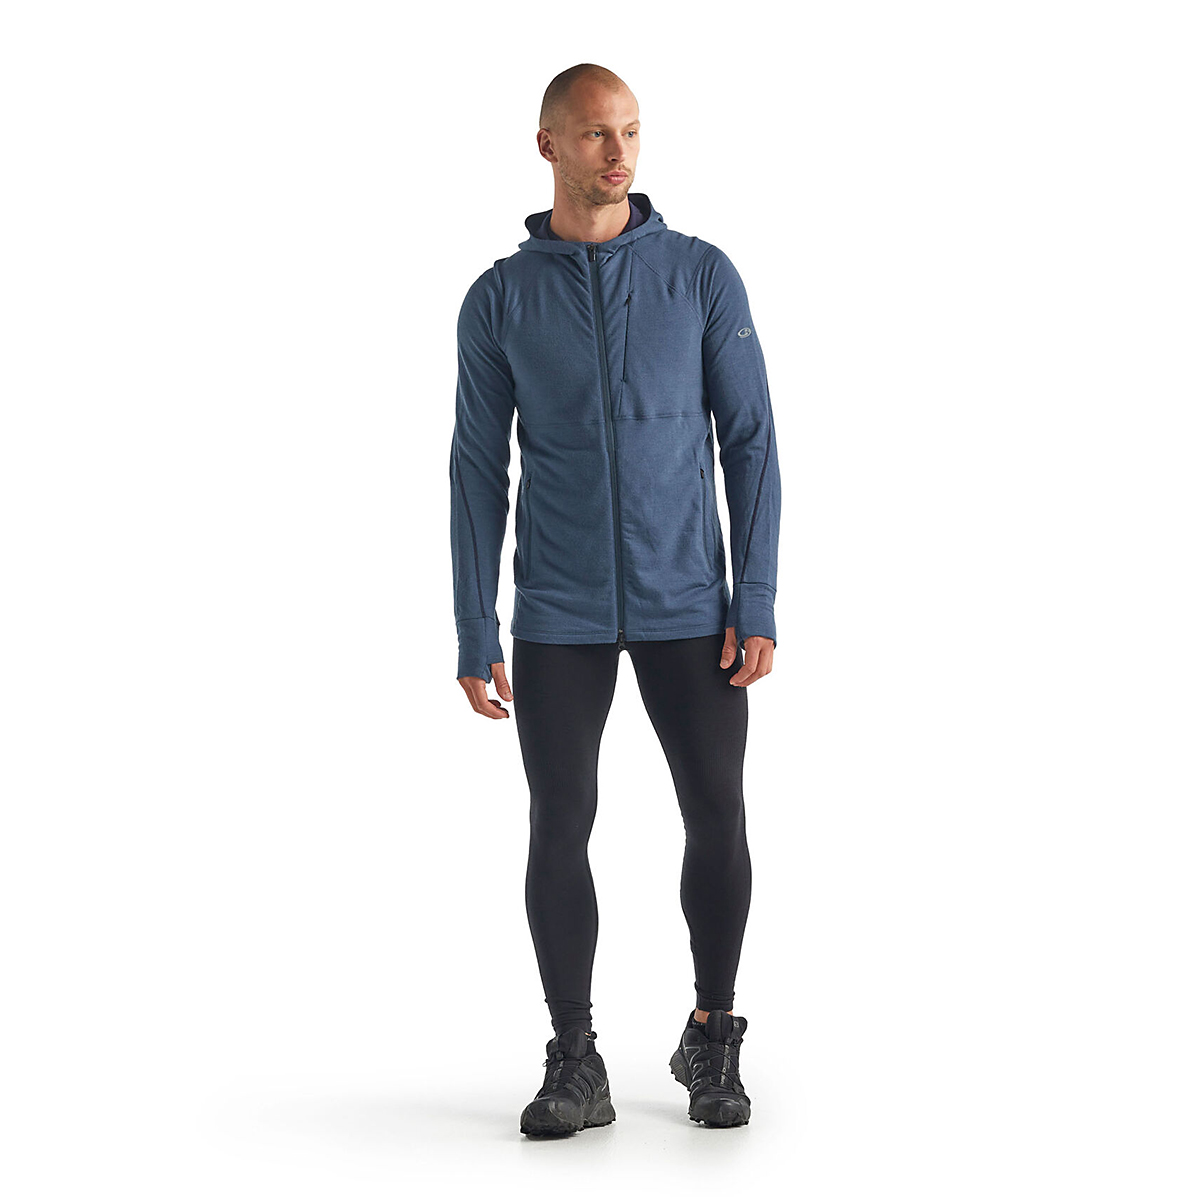 Men's Icebreaker Merino Quantum II Long Sleeve Zip Hood Jacket - Color: Serene Blue - Size: S, Serene Blue, large, image 3